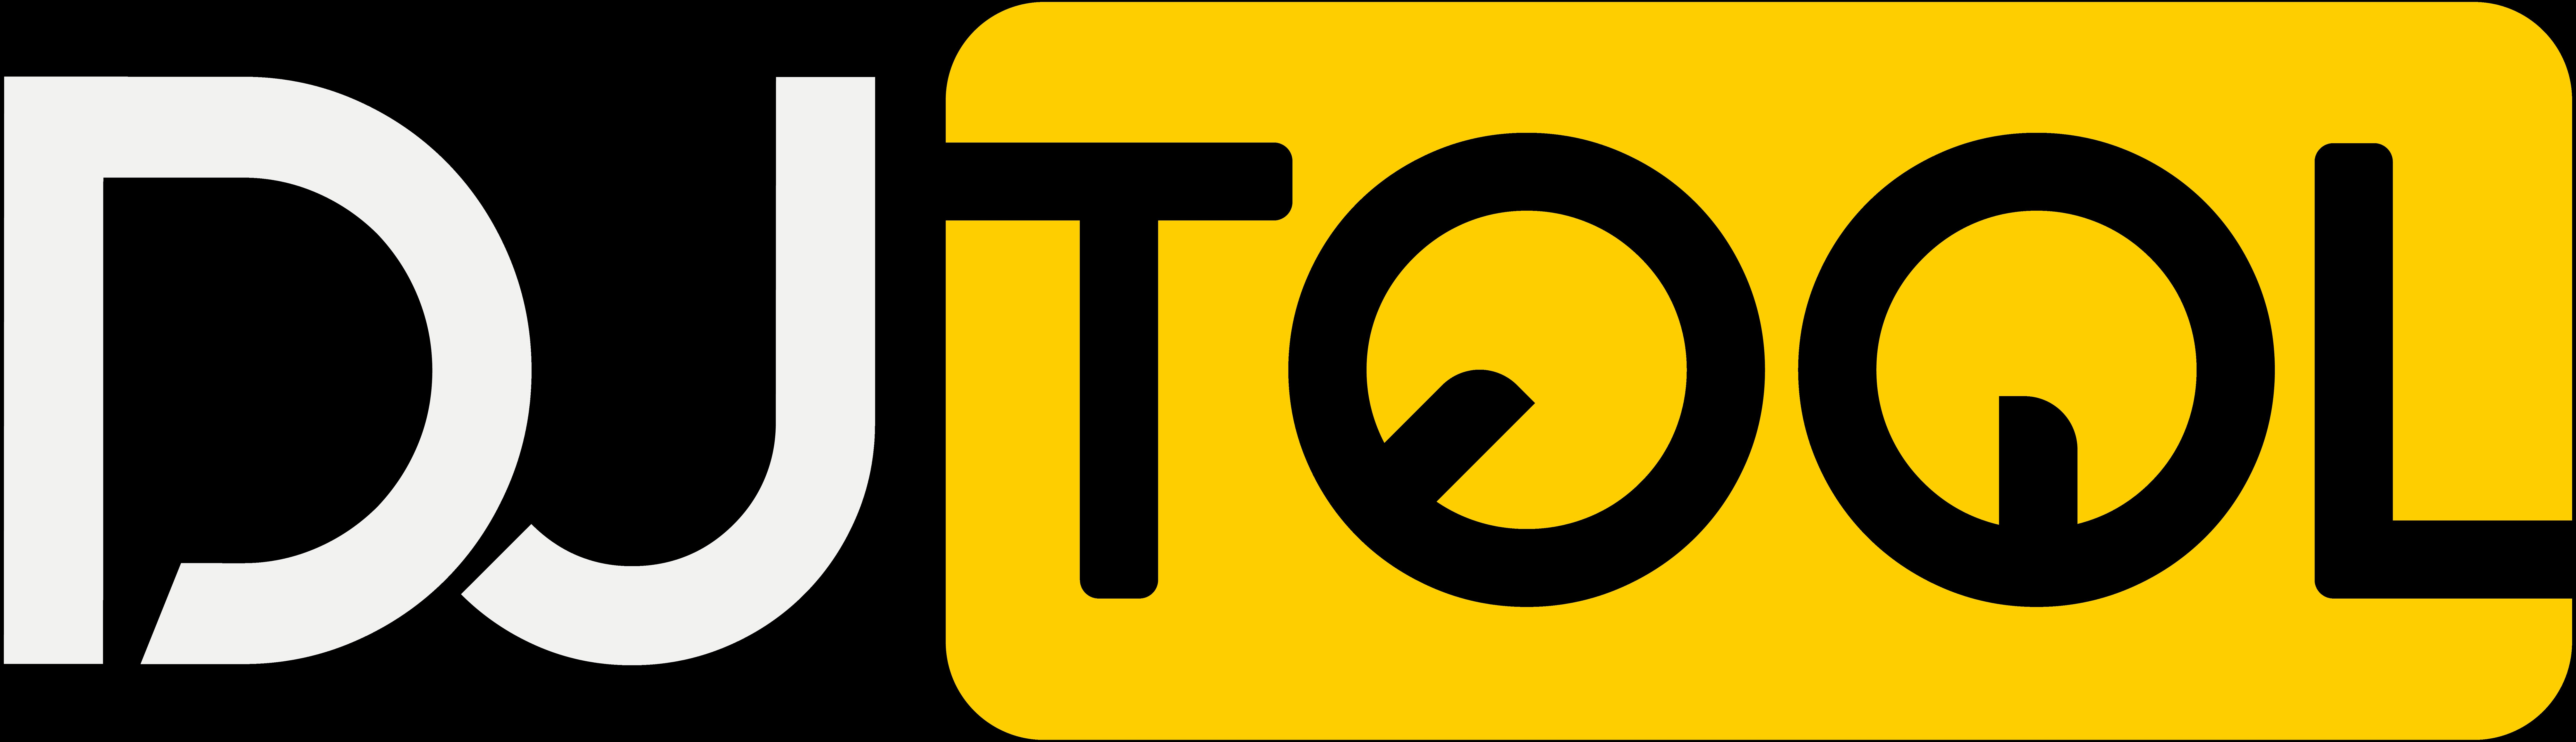 DJTOOL